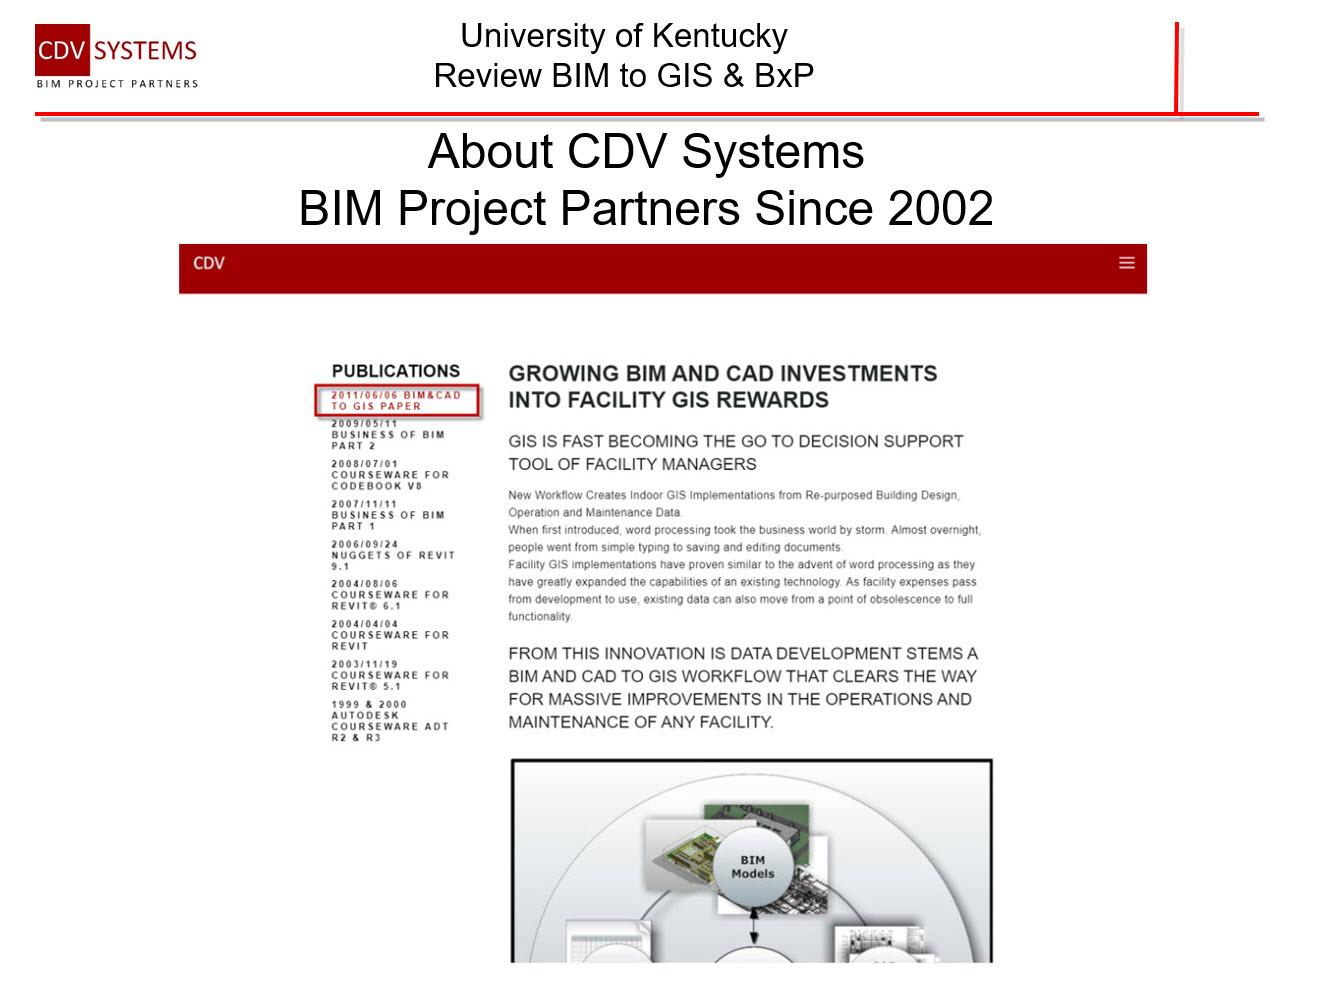 University of Kentucky_001l.jpg